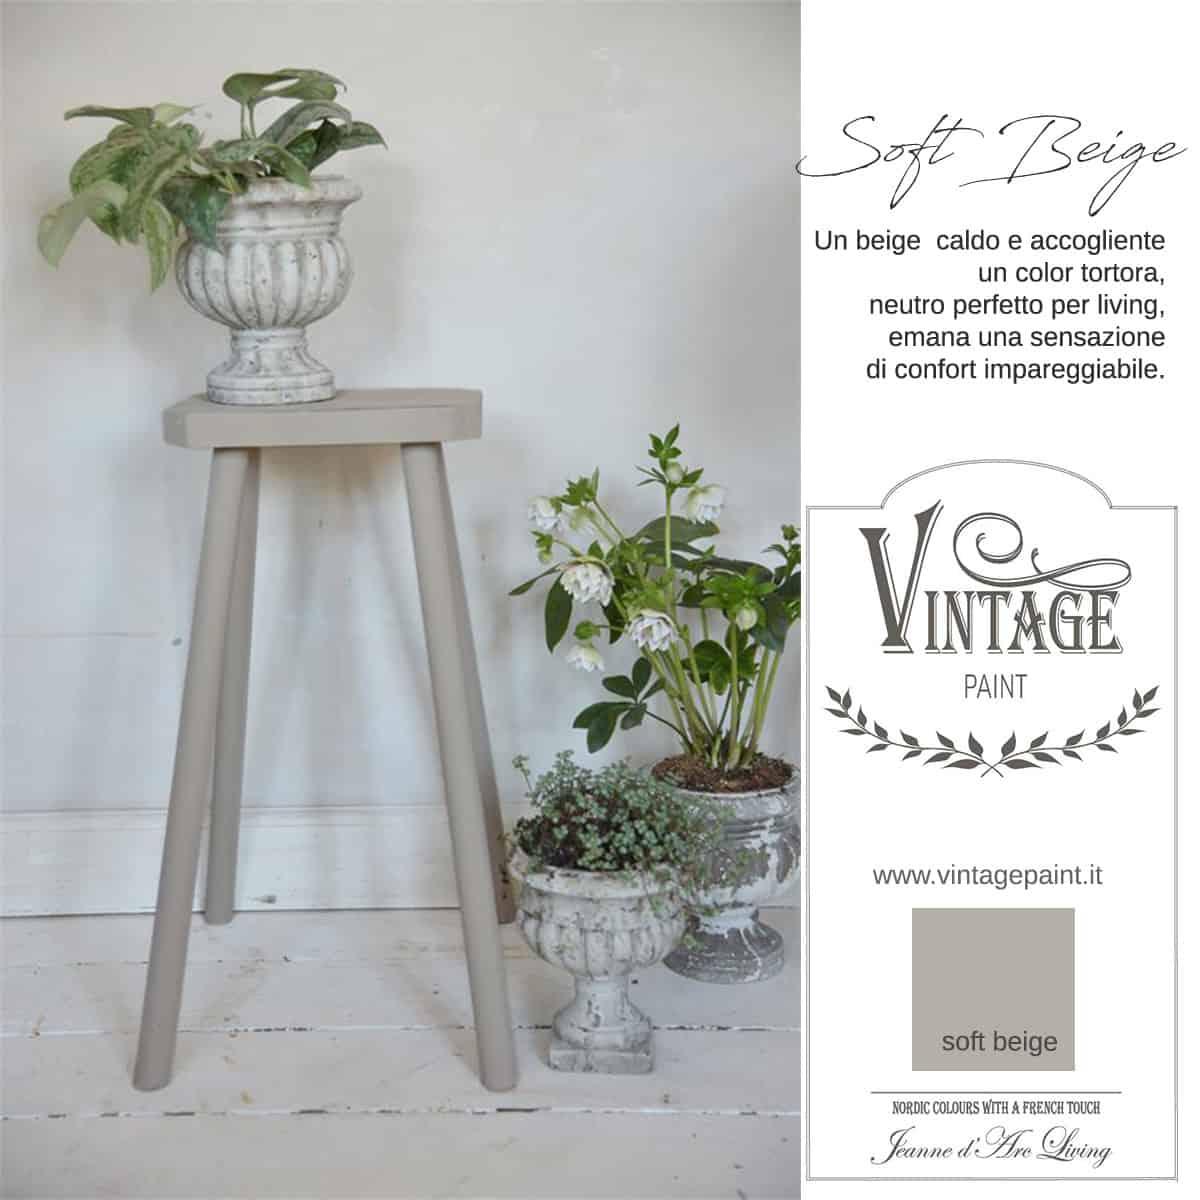 soft beige tortora vintage chalk paint vernici shabby chic autentico look gesso